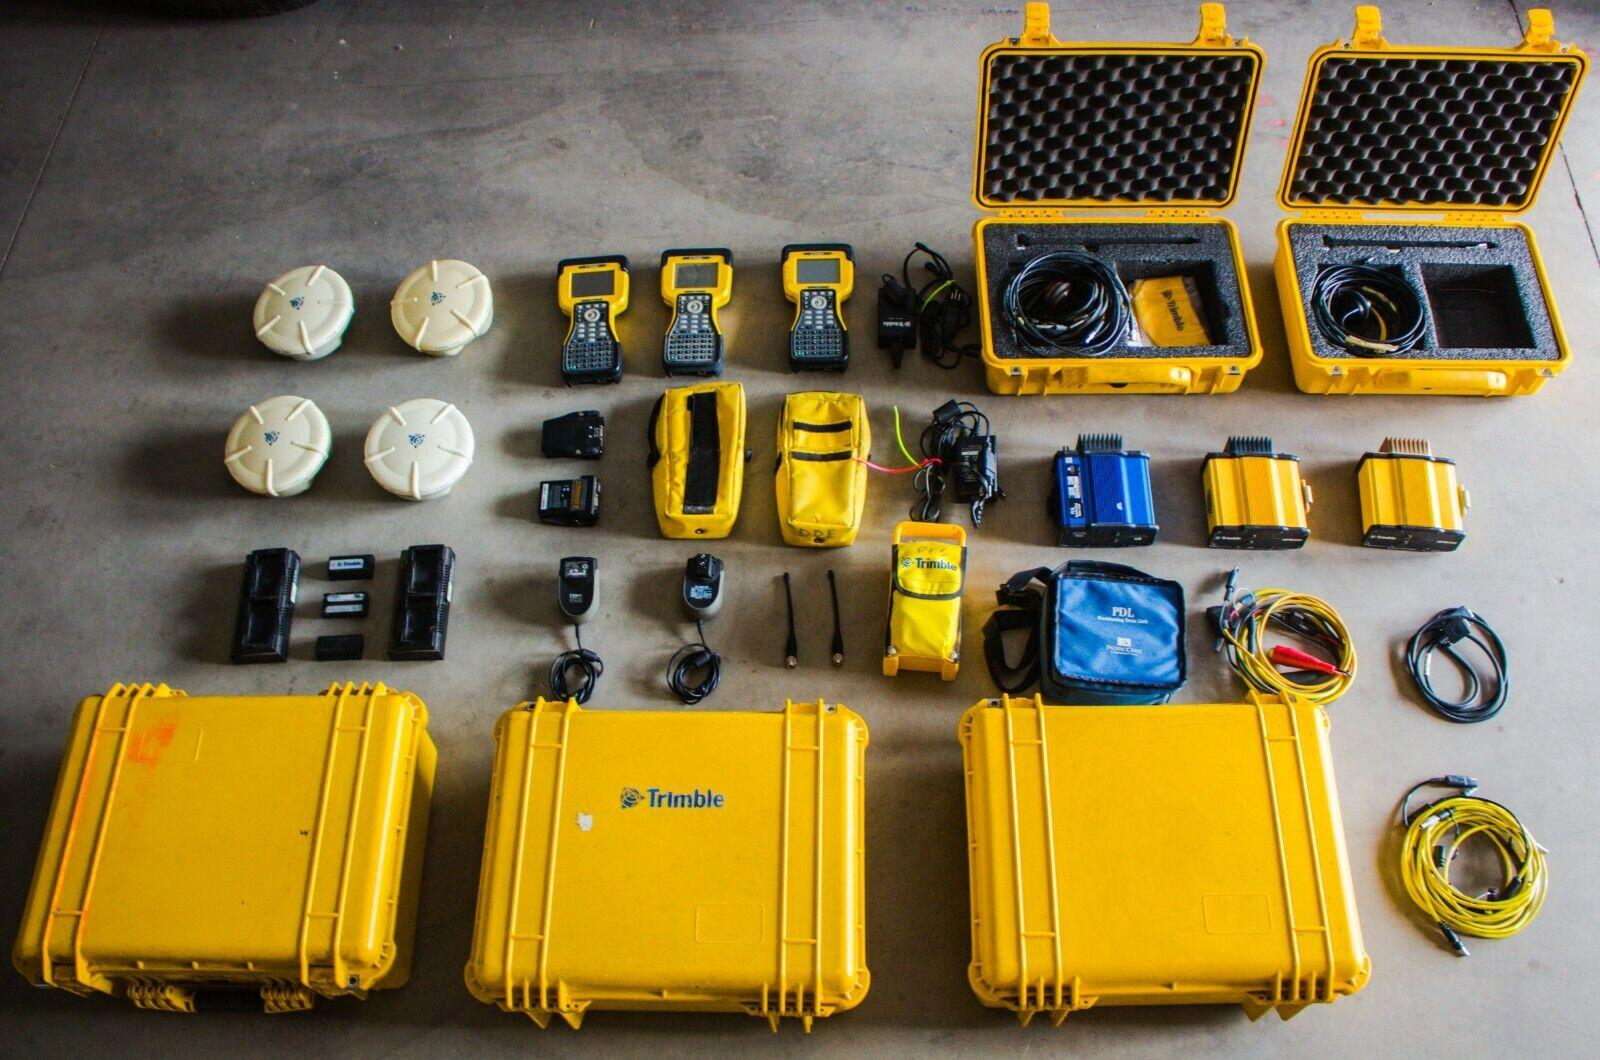 TRIMBLE R8 GPS System lot 4 Trimble R8 Model 1 5800 base 2 TSC2 data collectors